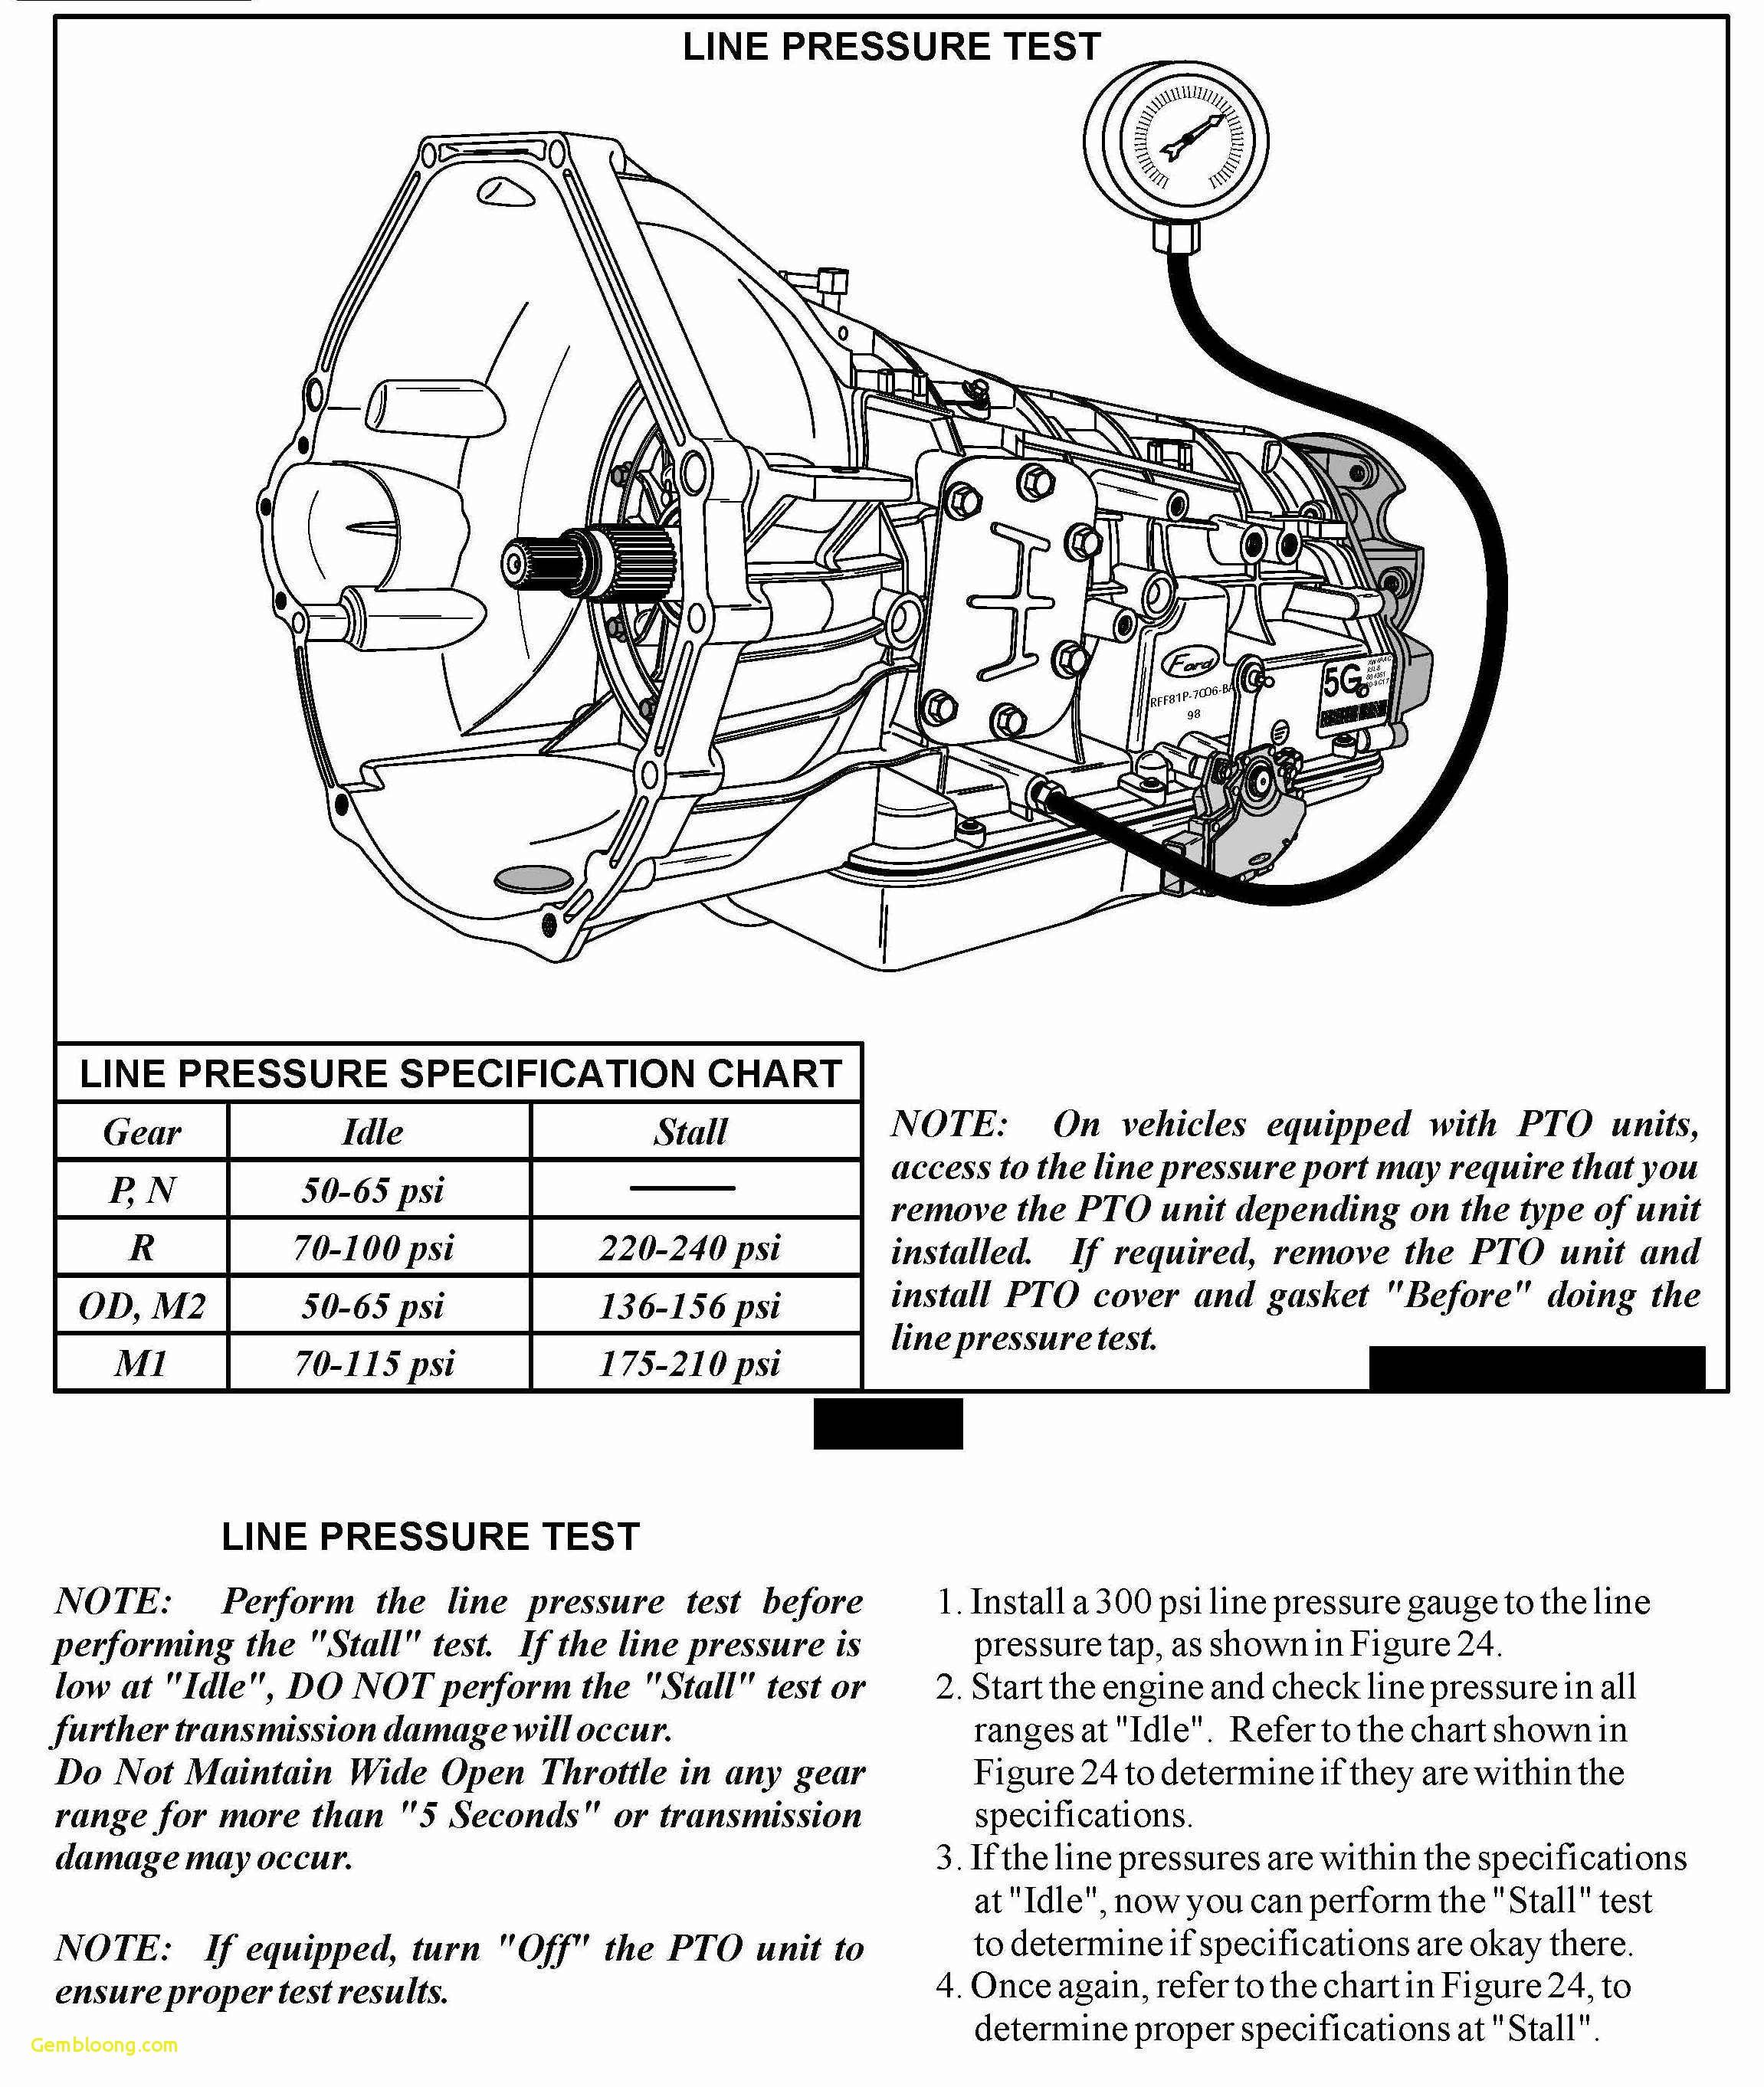 Truck Drivetrain Diagram Download ford Trucks Wiring Diagrams ford Truck Wiring Diagrams Of Truck Drivetrain Diagram